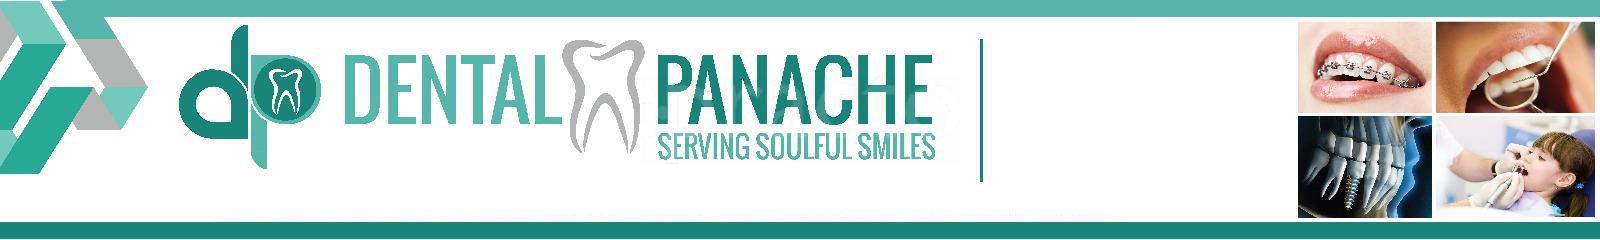 Dental Panache